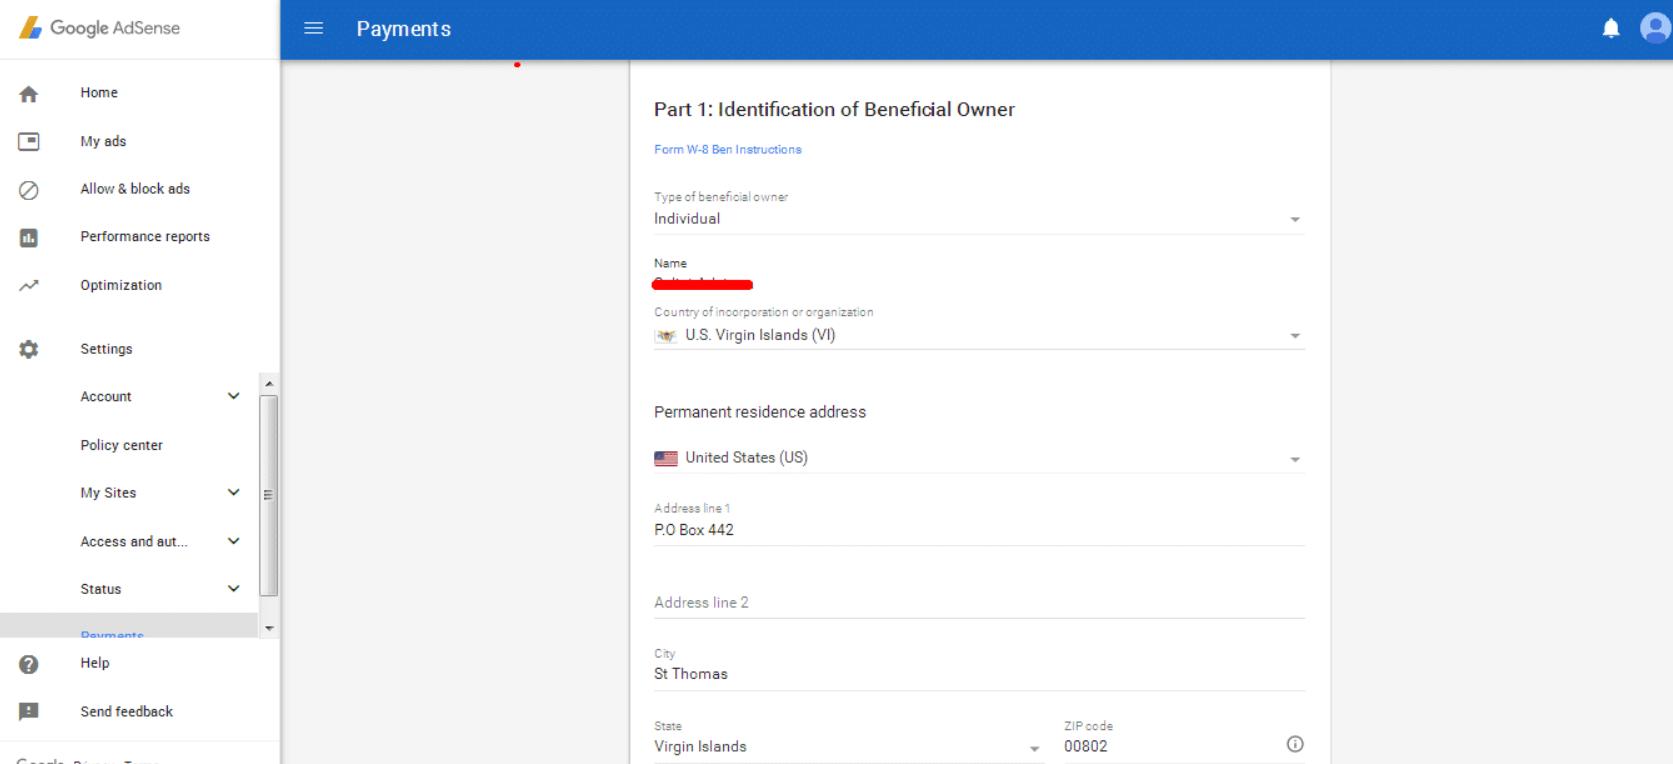 Submit Google Adsense Tax Form